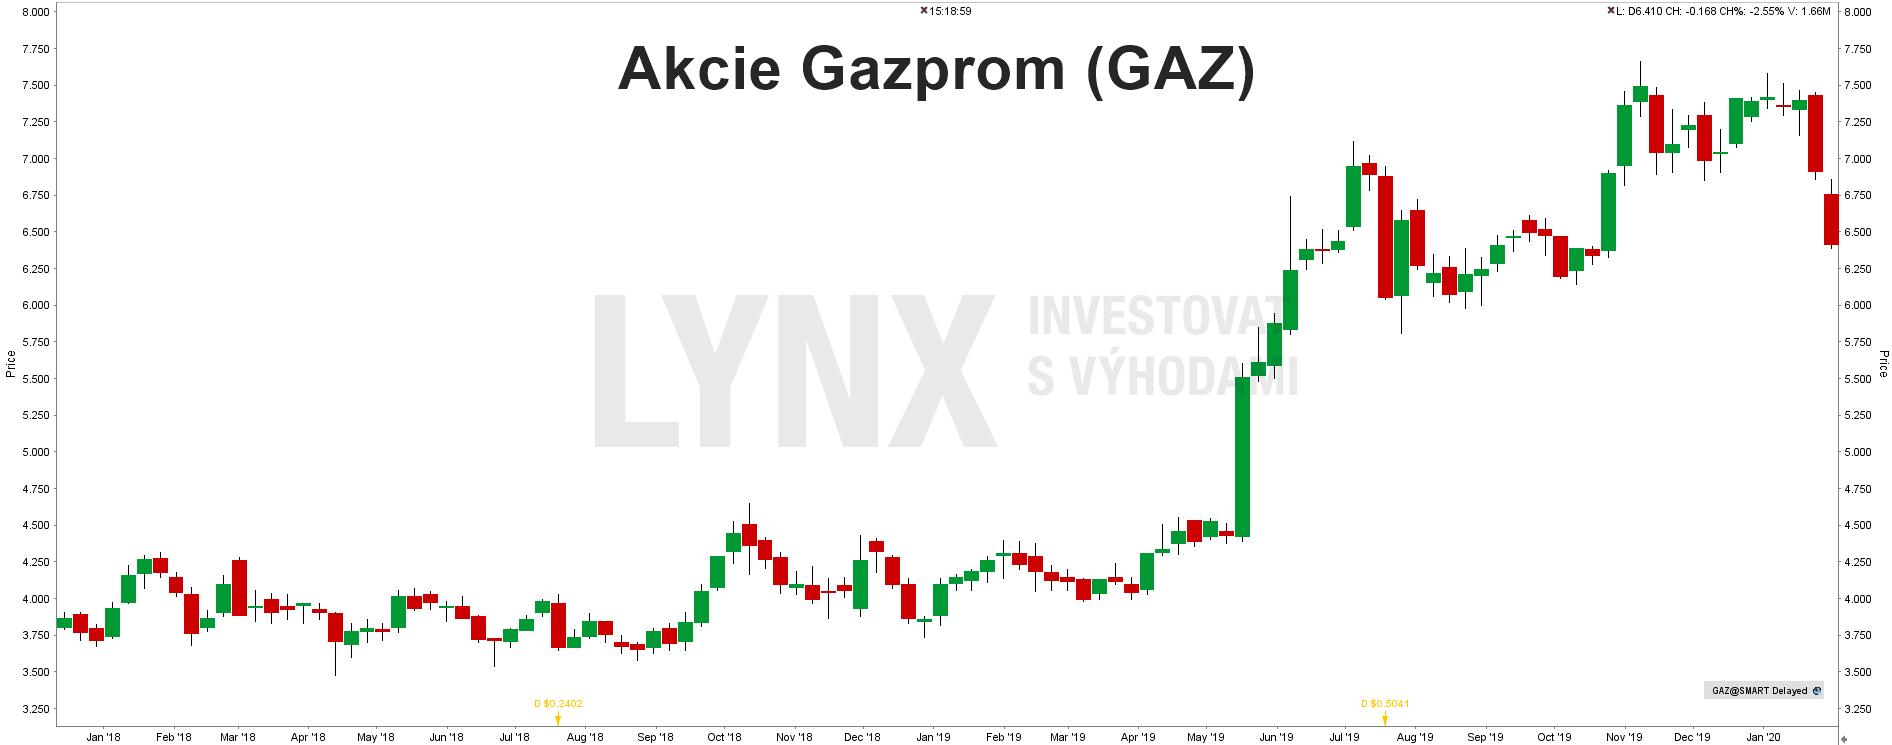 Akcie Gazprom